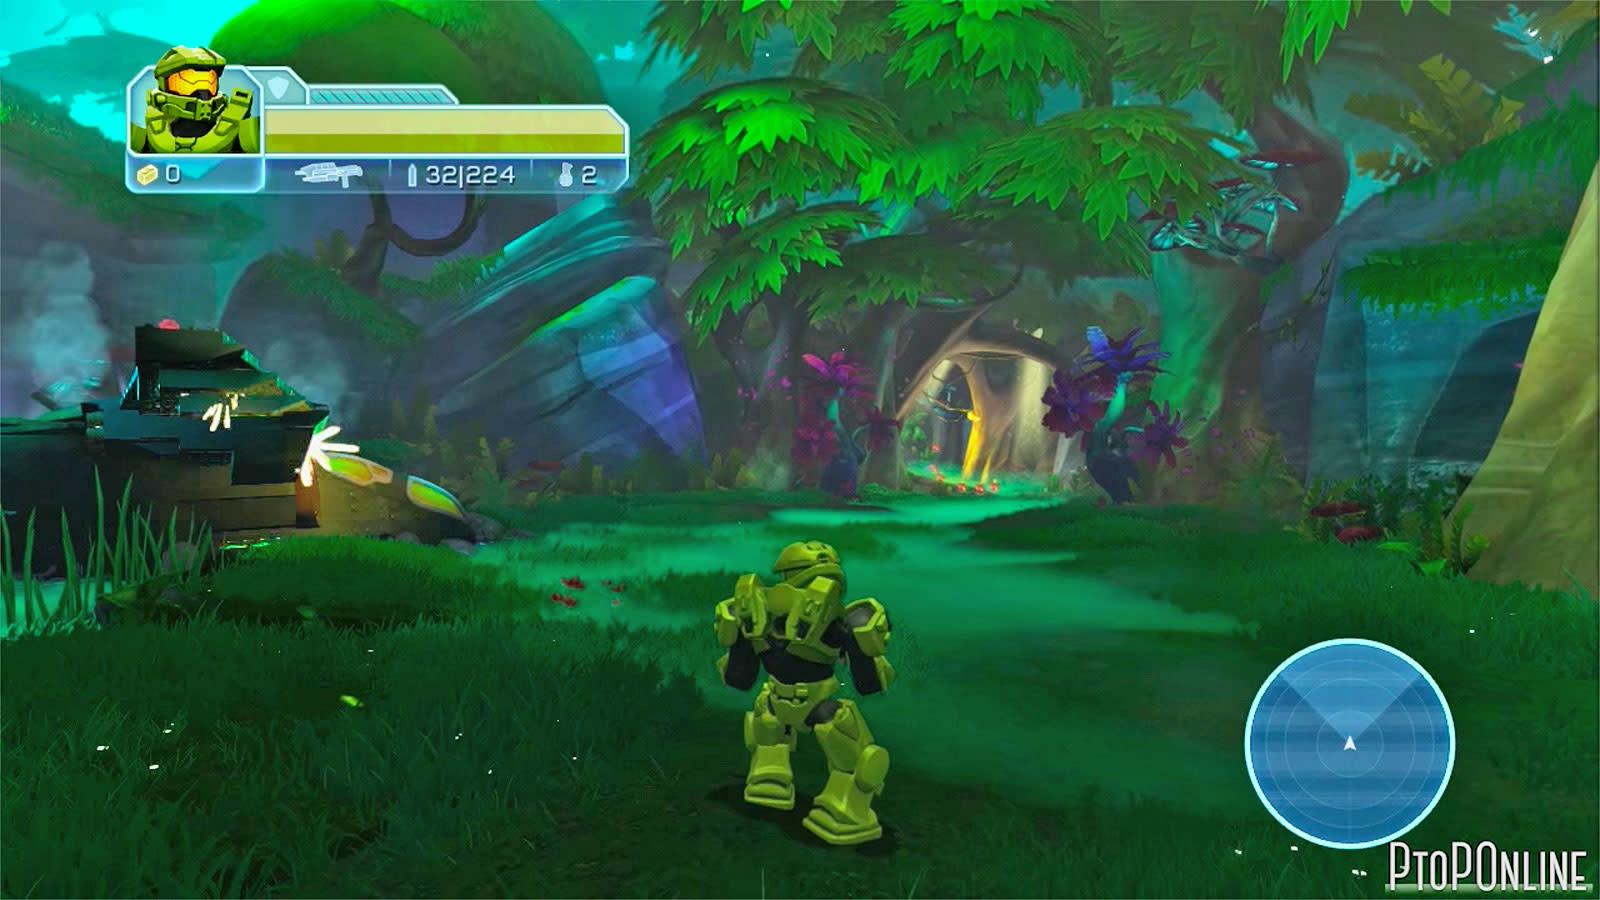 Halo Developer Hints It Could Revive A Scrapped Mega Bloks Game Engadget